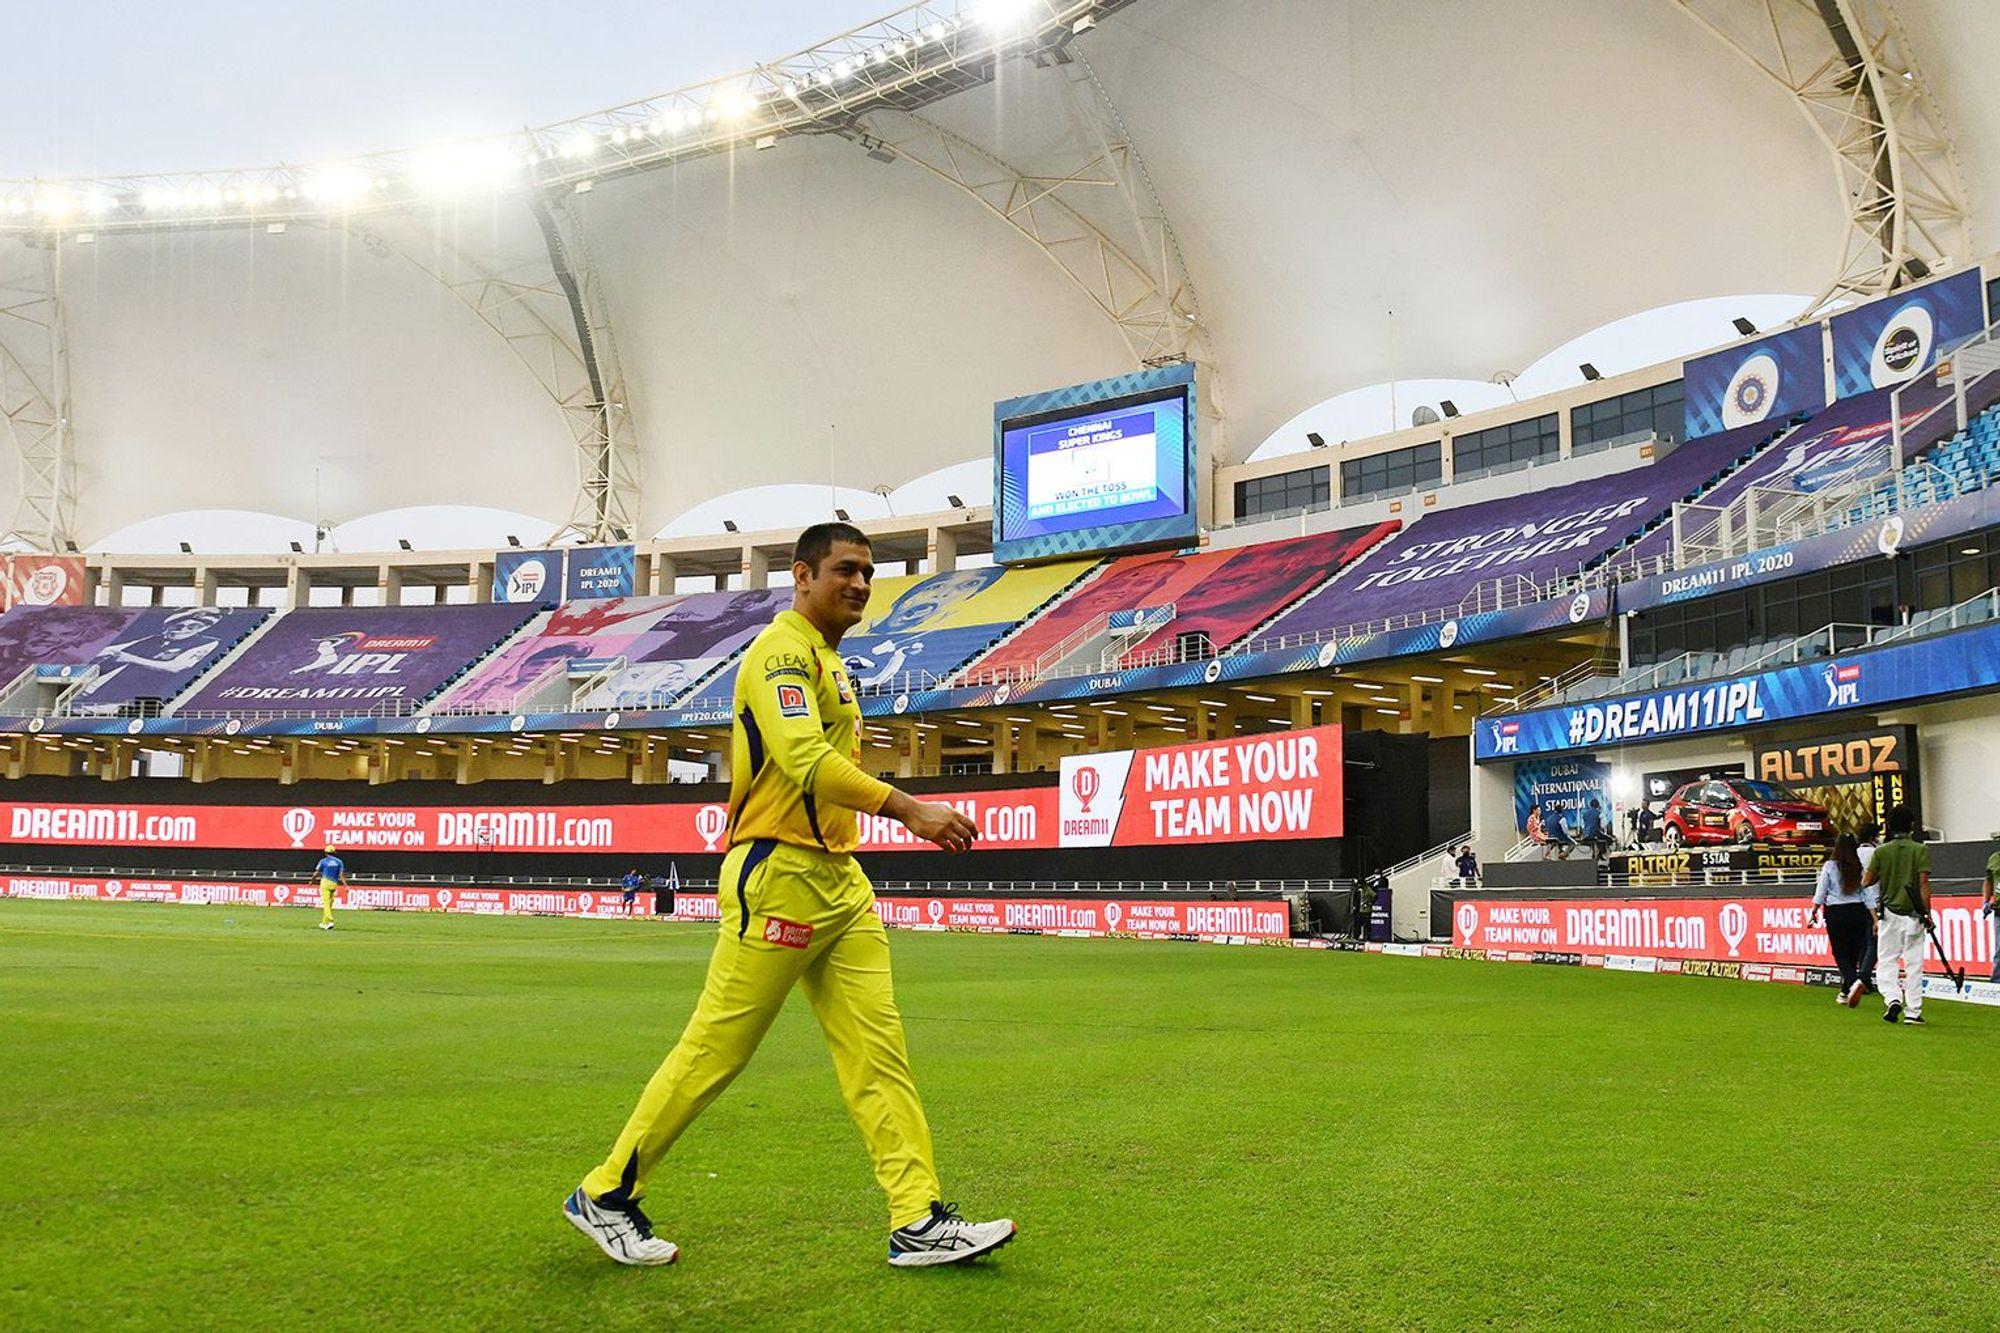 MS Dhoni will lead CSK in the IPL 2021 | BCCI/IPL